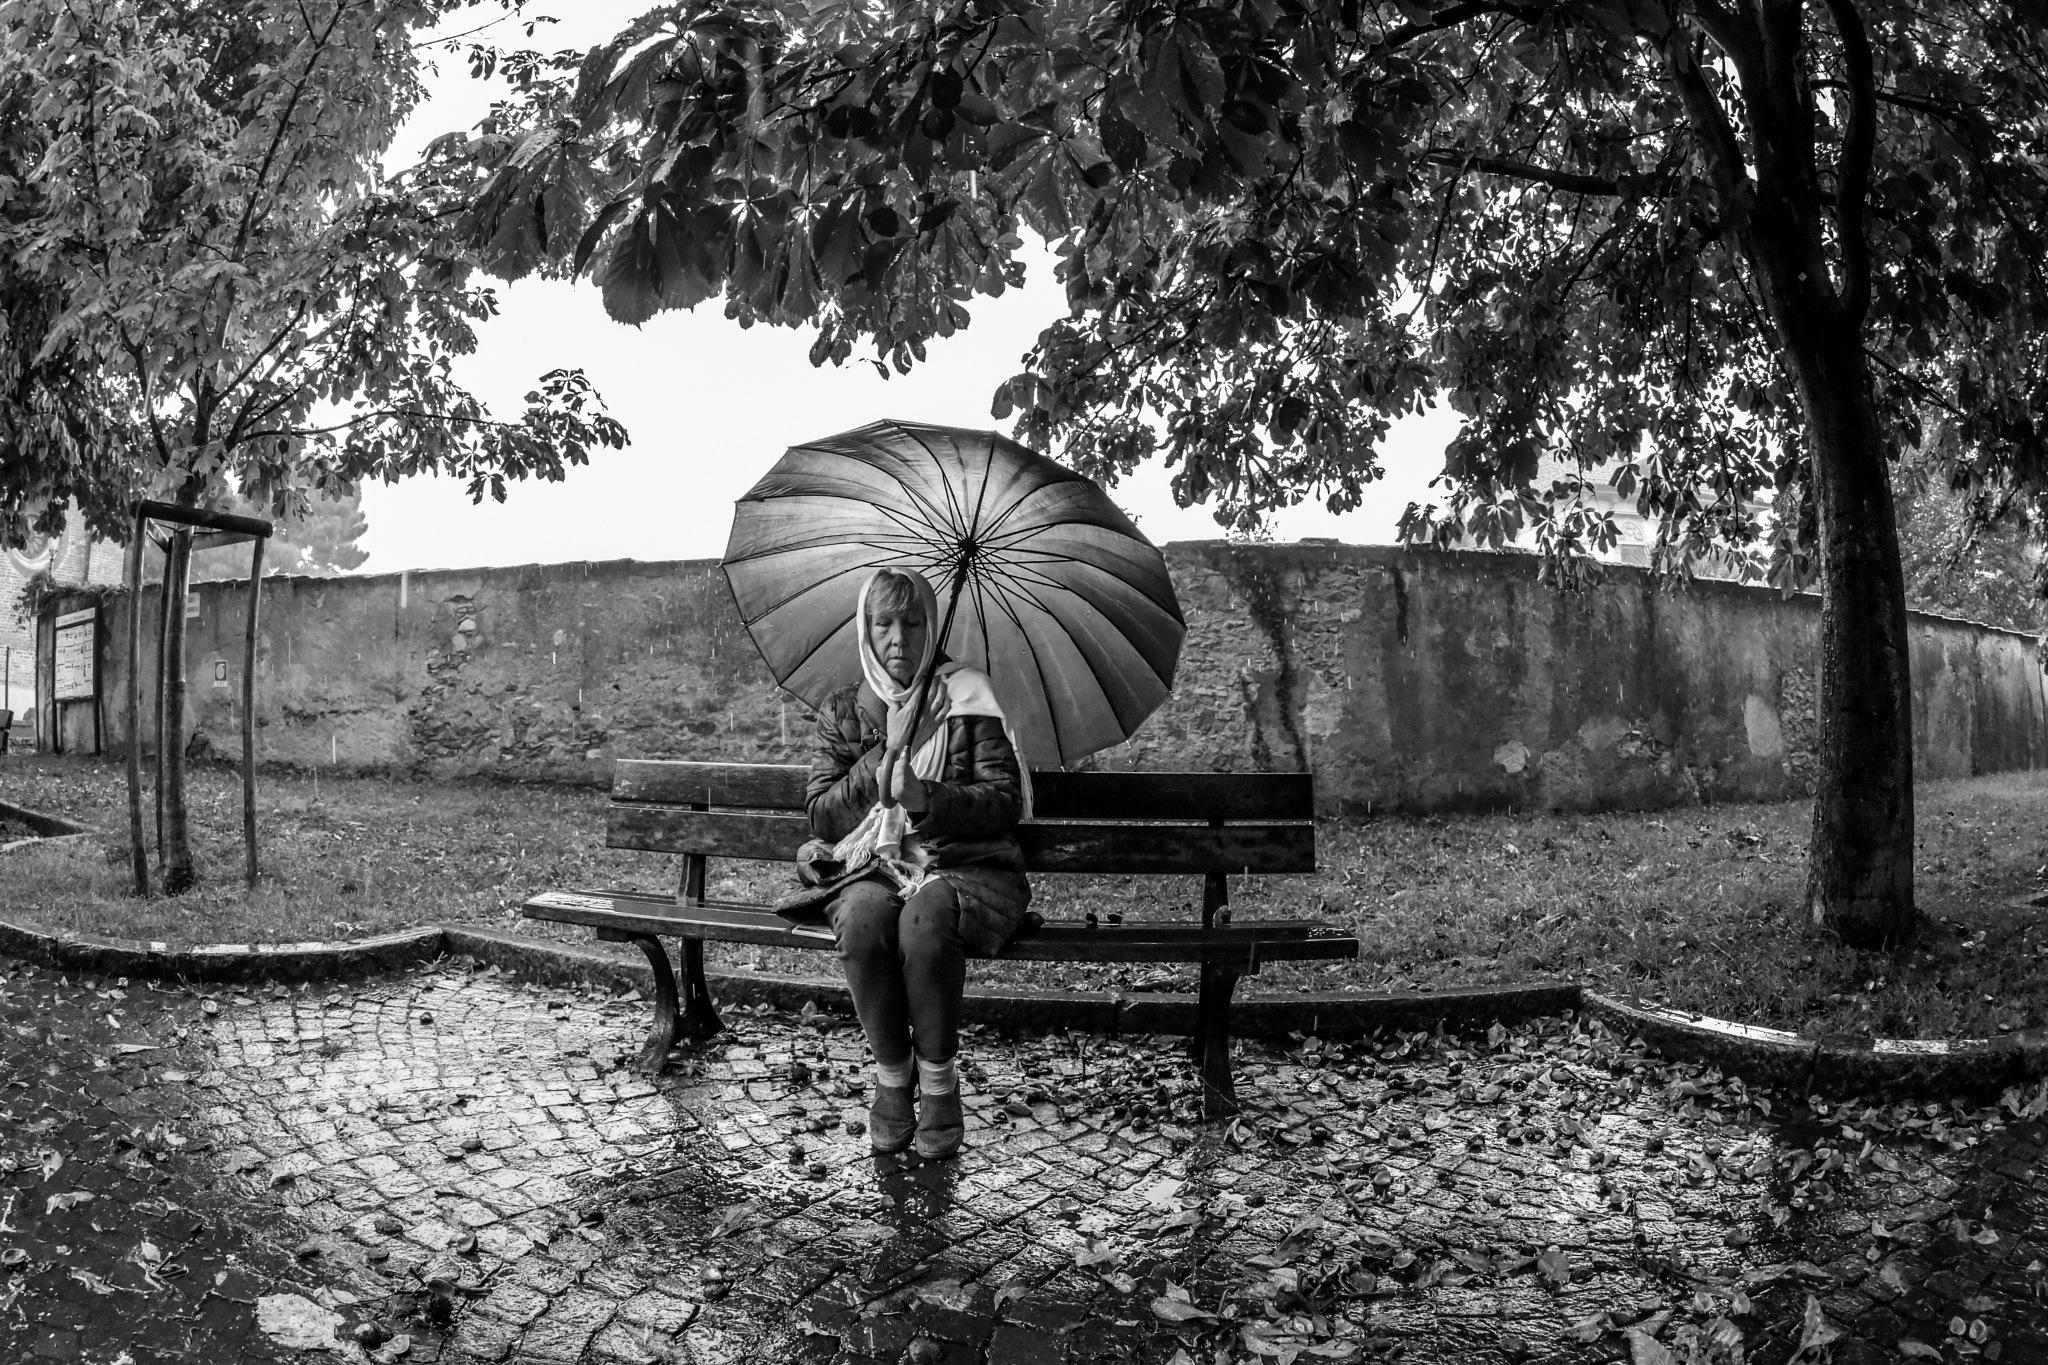 solitudine by brunogagliardi49